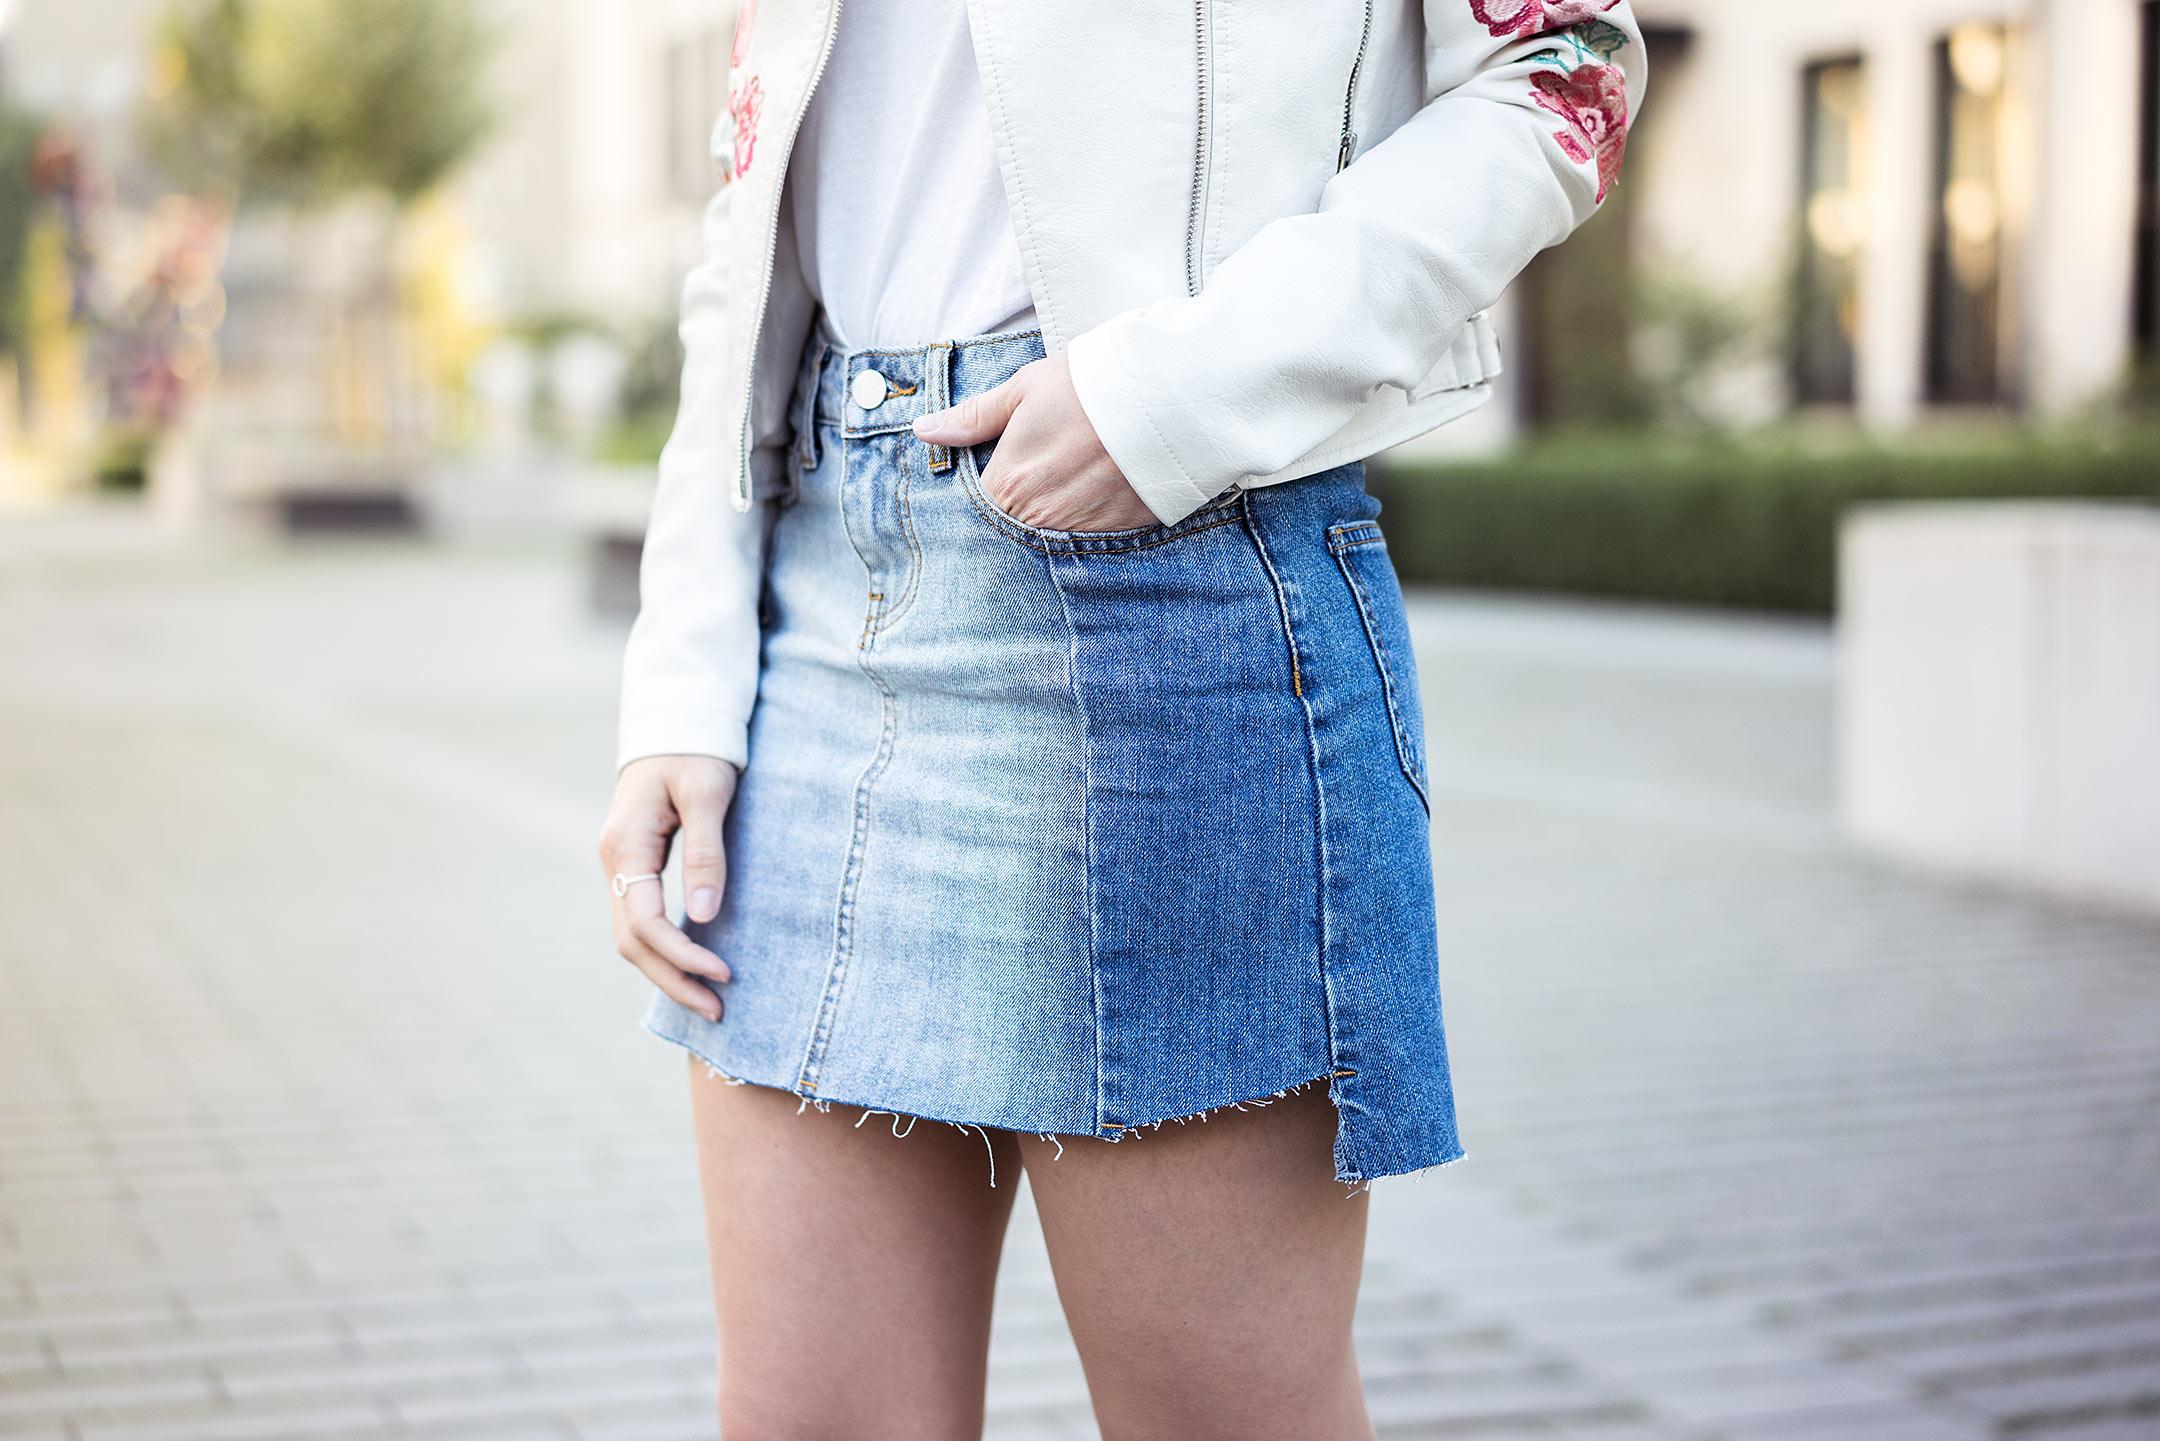 Vokuhila Rock Jeans Springlook Detail Sunnyinga Fashionblog